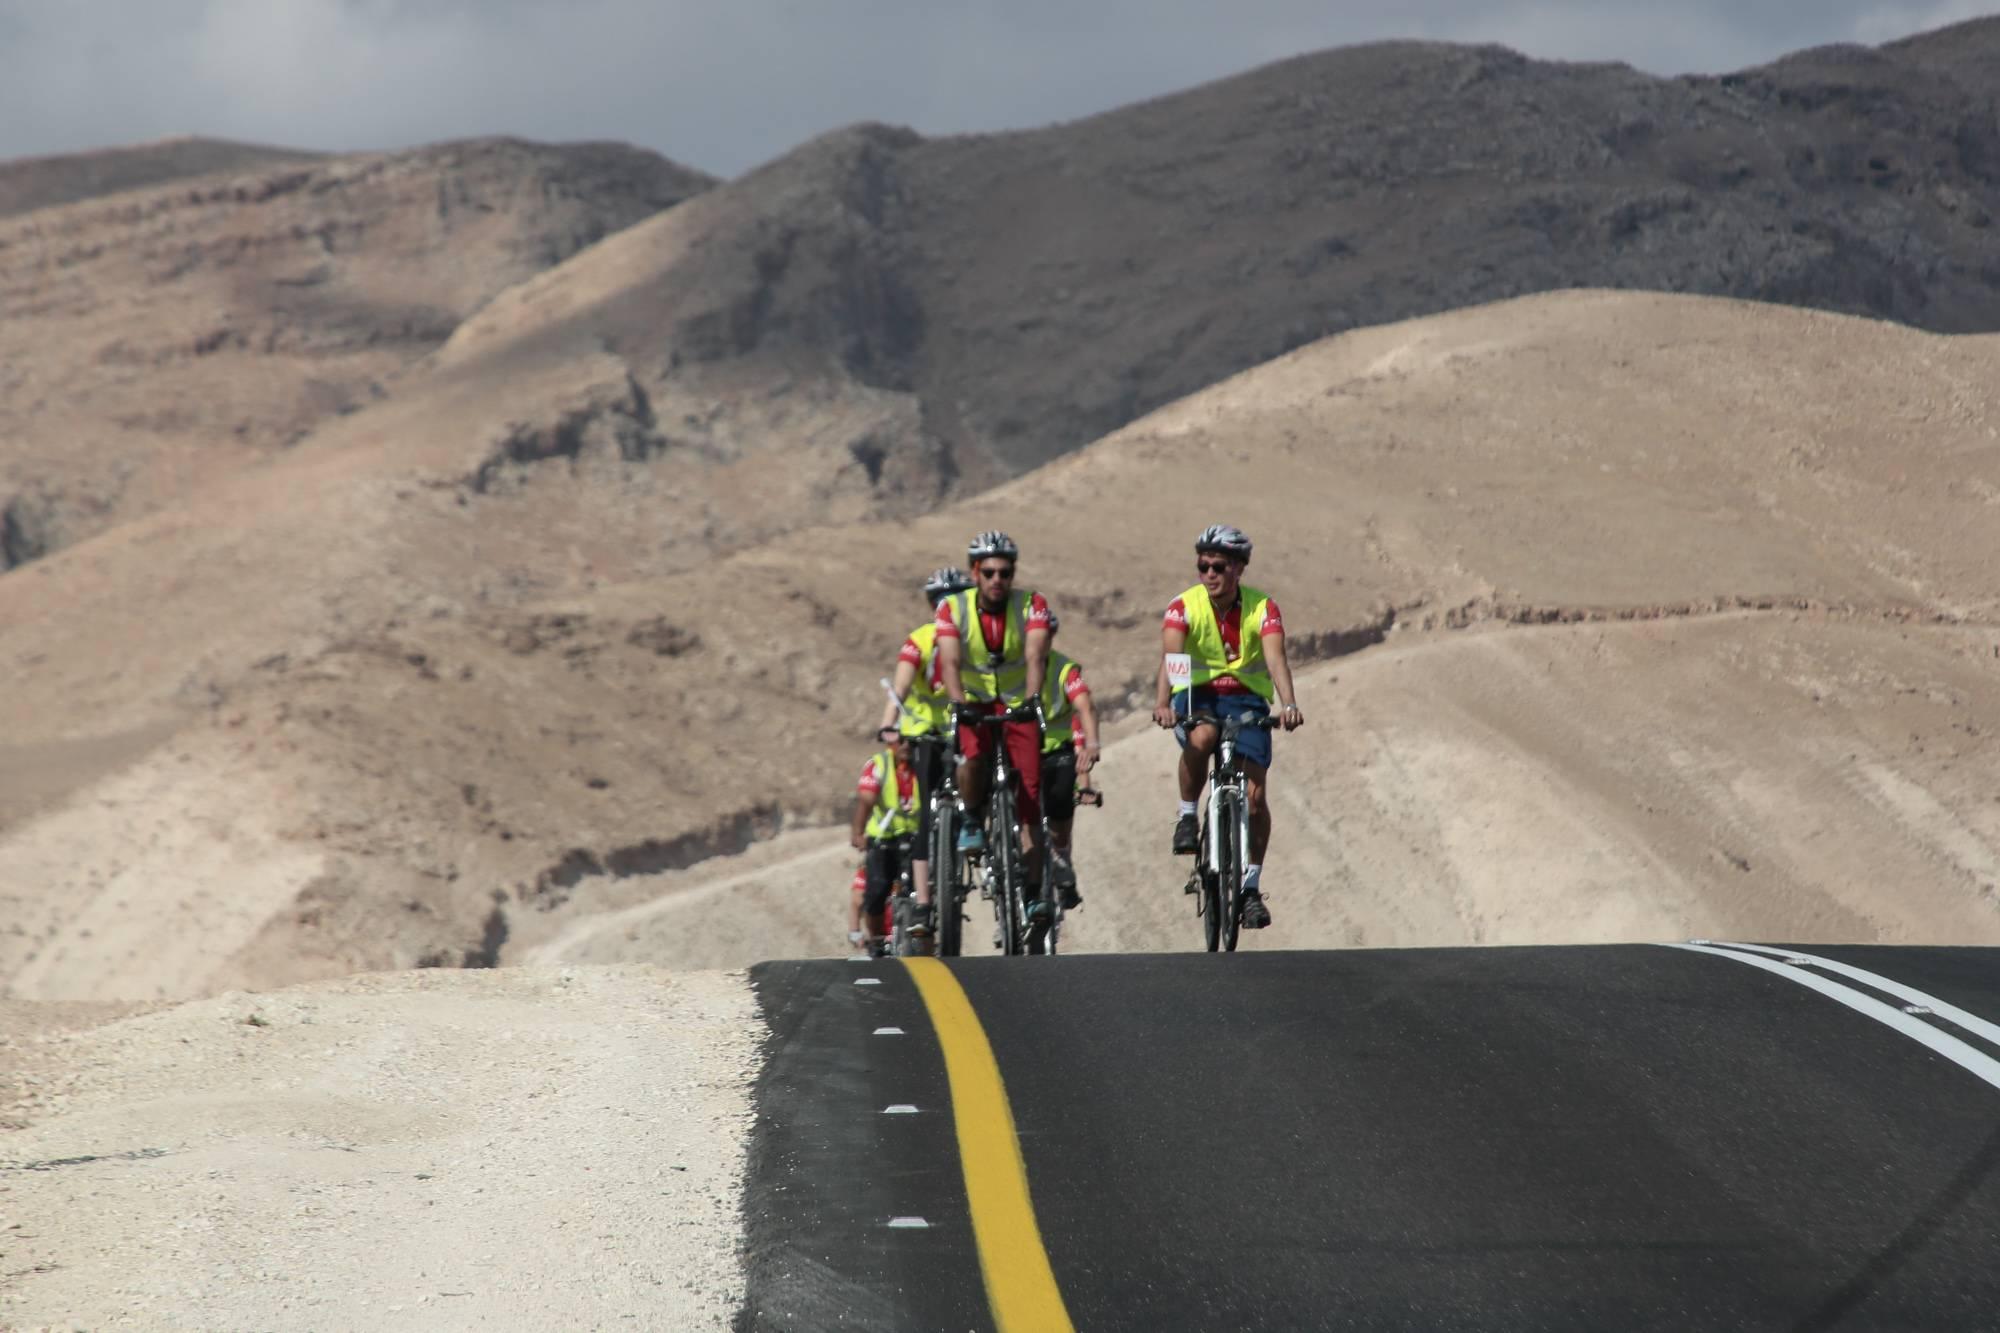 Картинки по запросу bike tour palestine